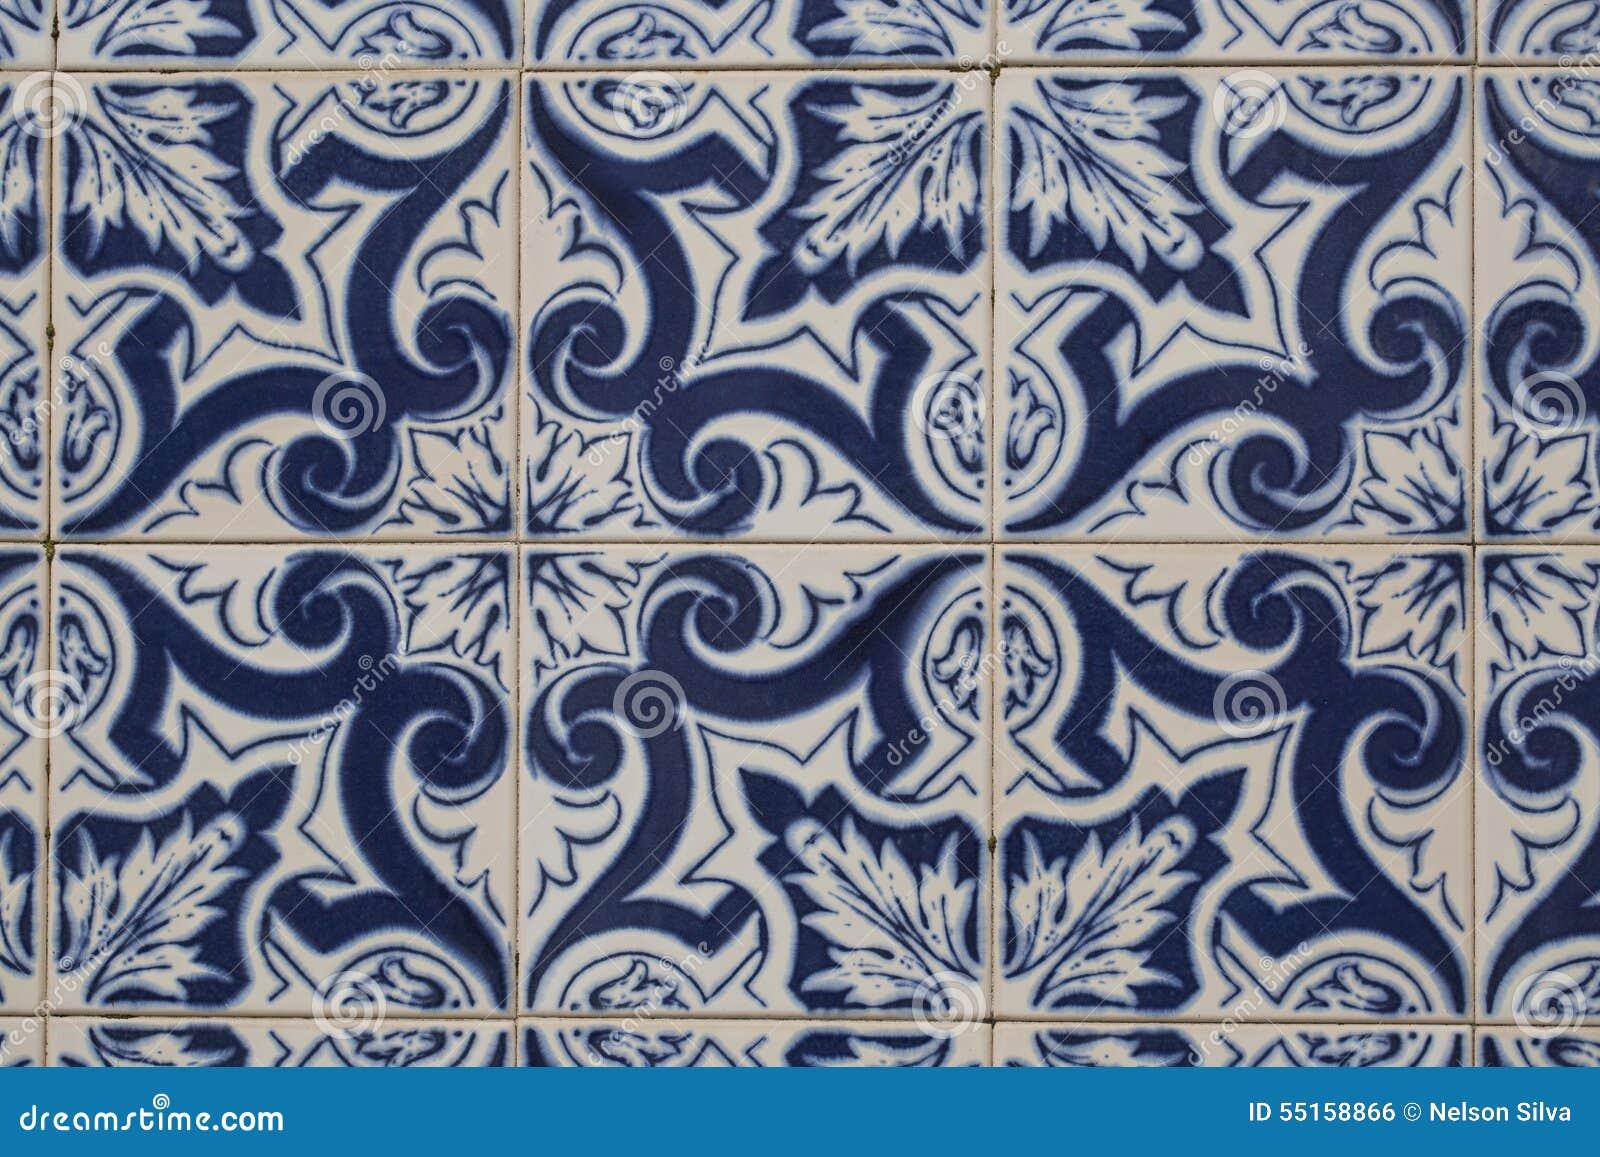 Vintage Ceramic Tile Stock Photo Image 55158866